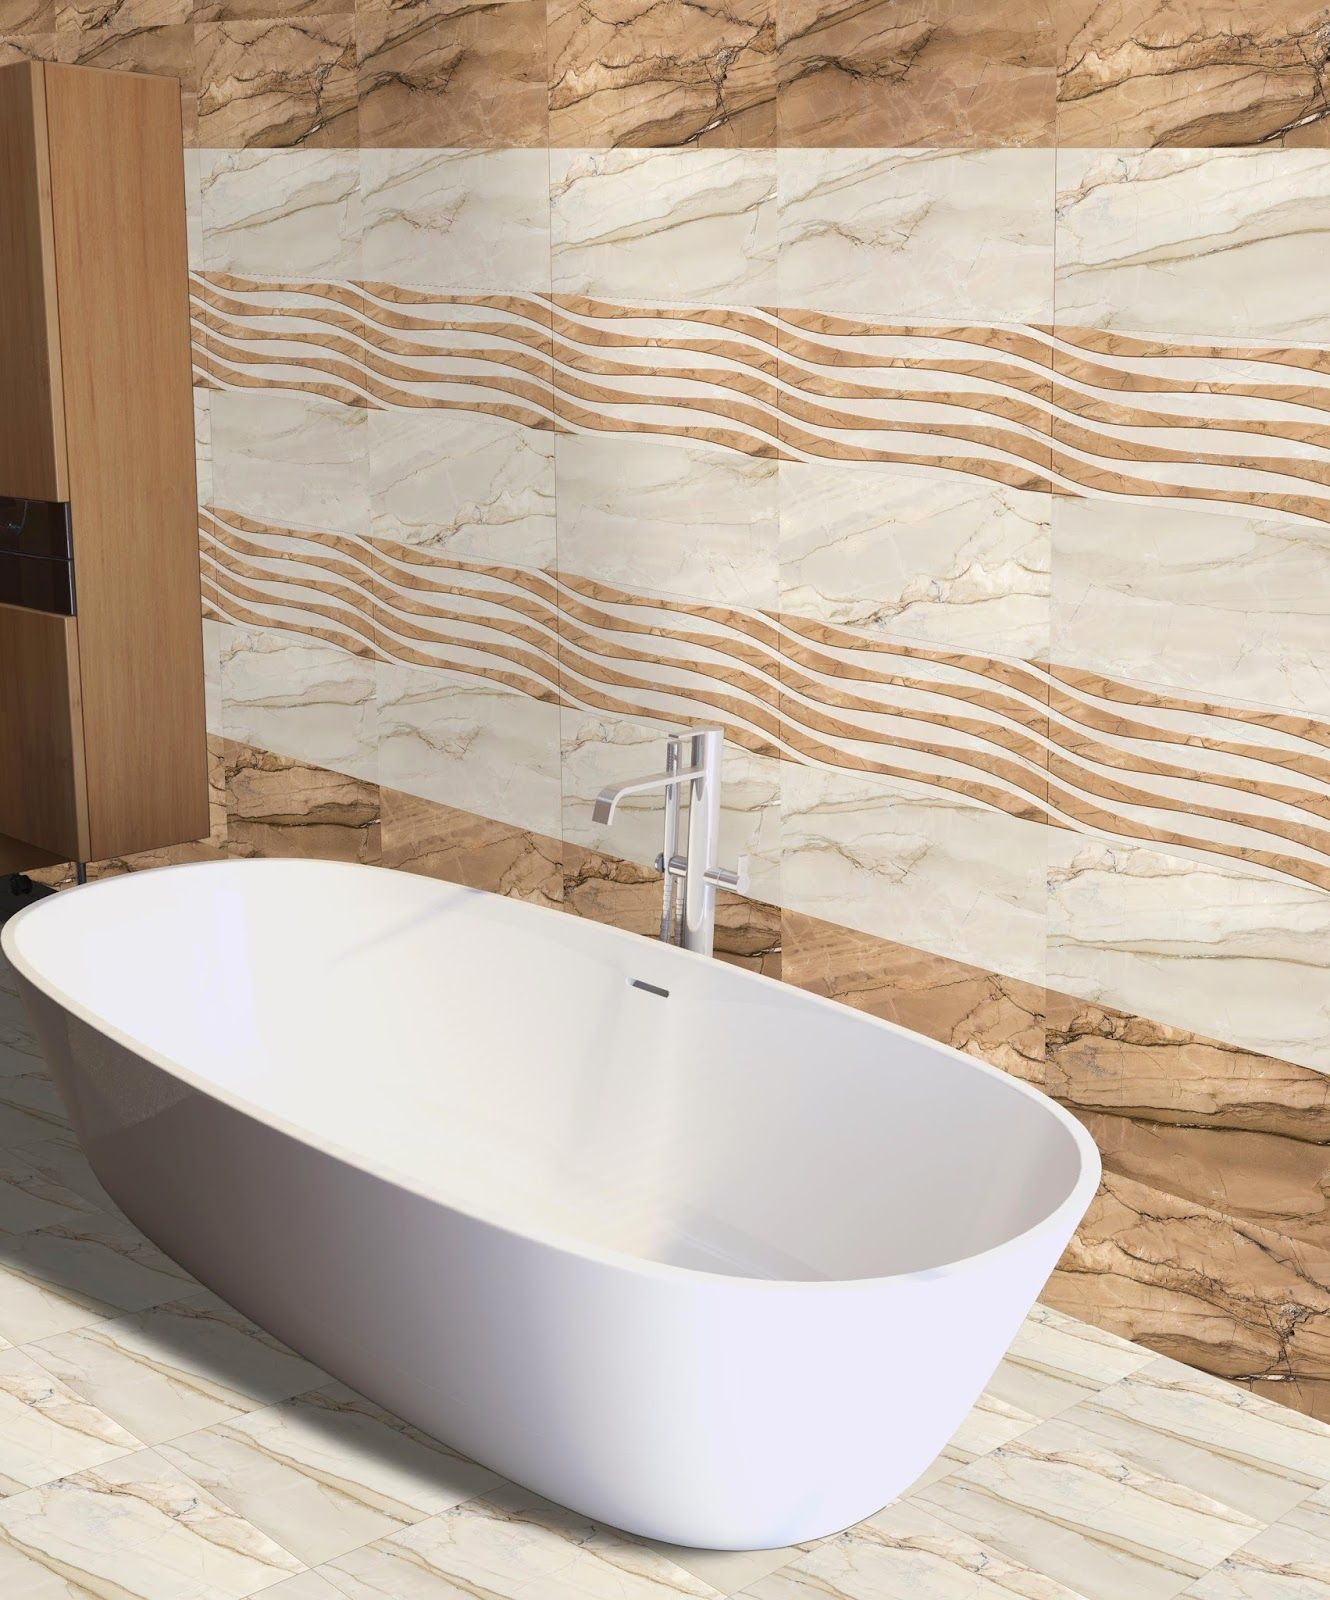 Bathroom Tiles India Ideasbathroom Tiling Tile